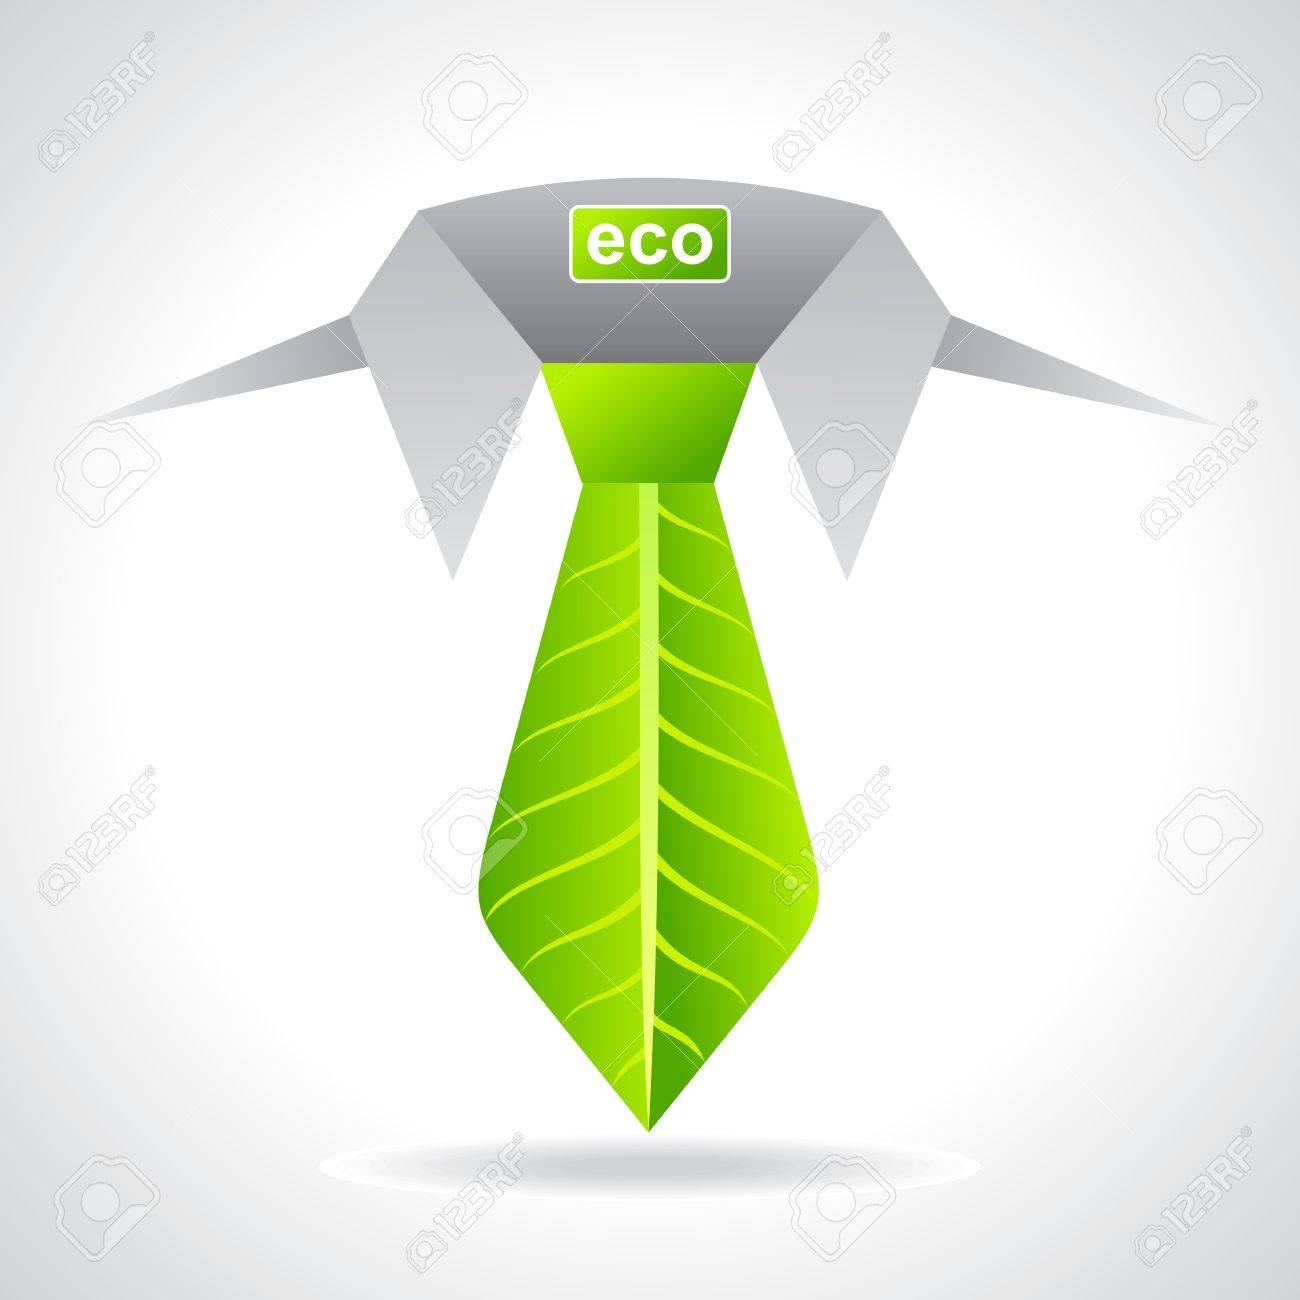 environment friendly business concept Stock Vector - 20881567